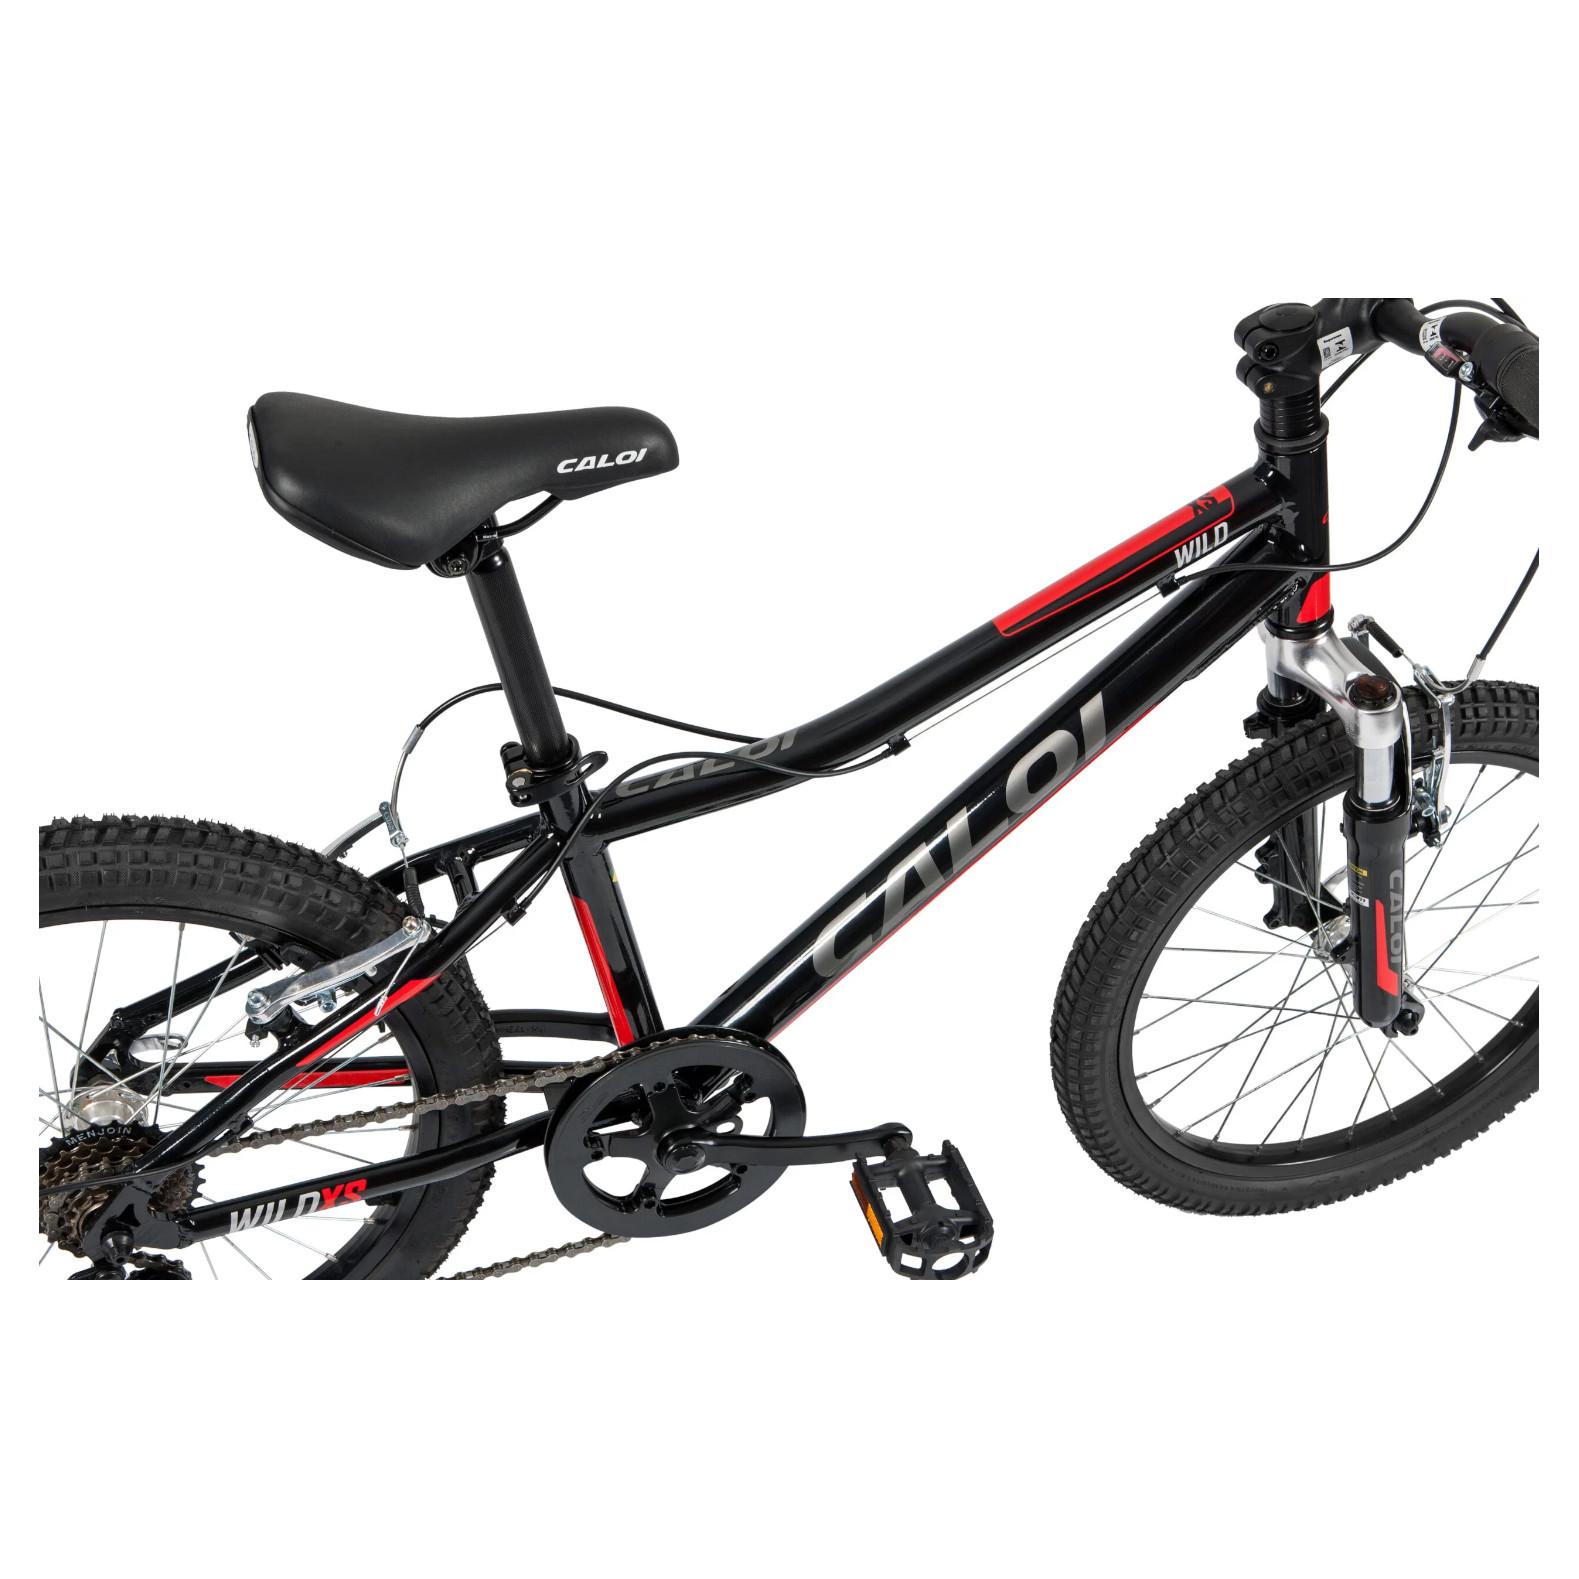 Bicicleta Infantil Caloi Wild XS Aro 20 7v 2021